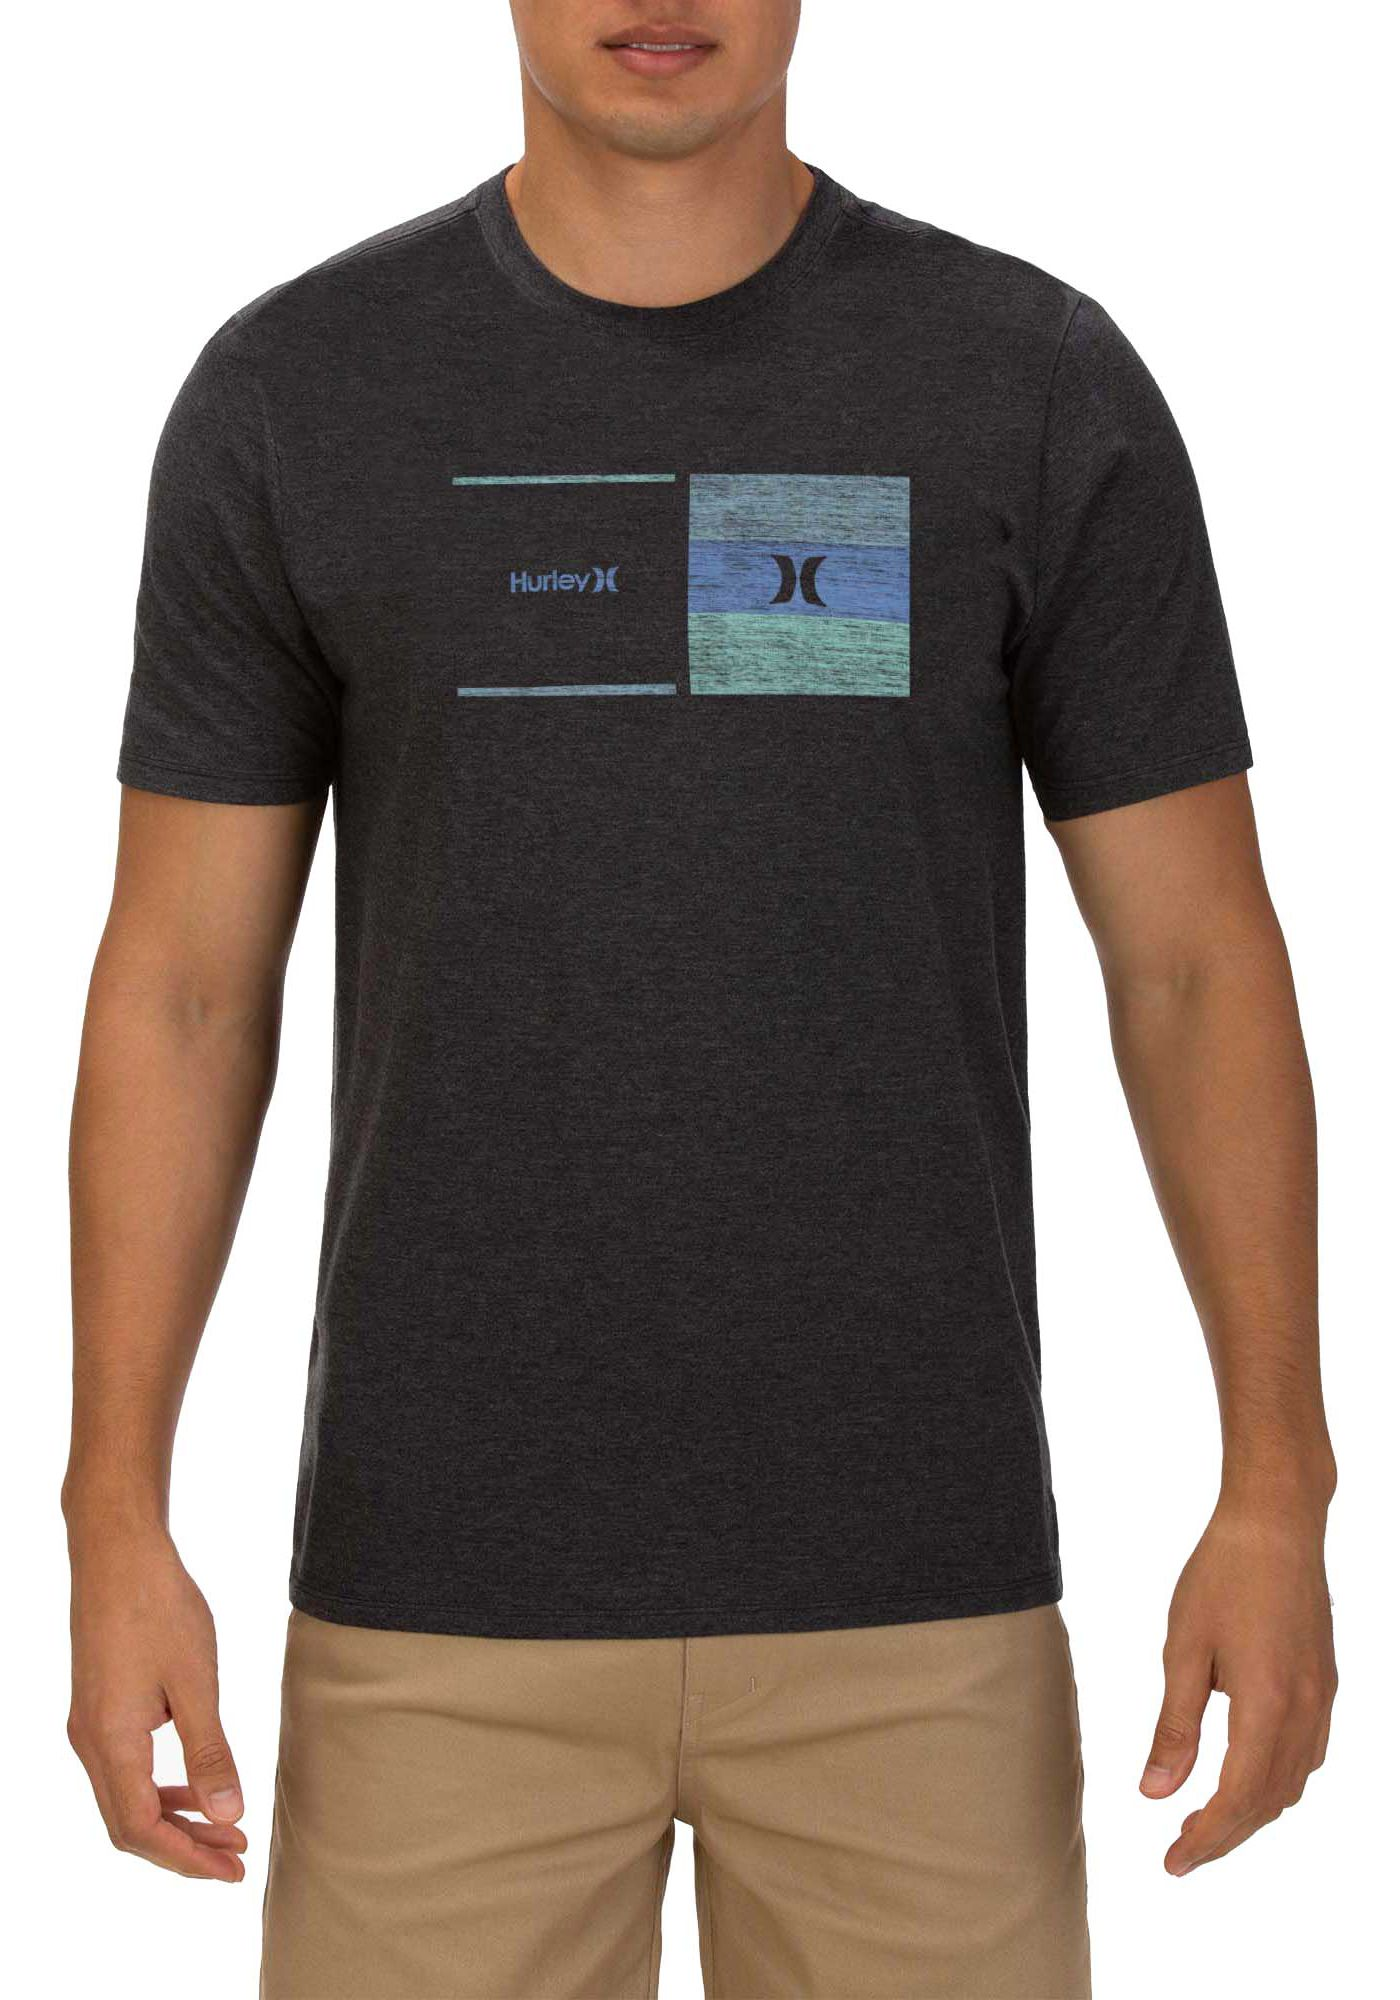 Hurley Men's Breaking Point T-Shirt